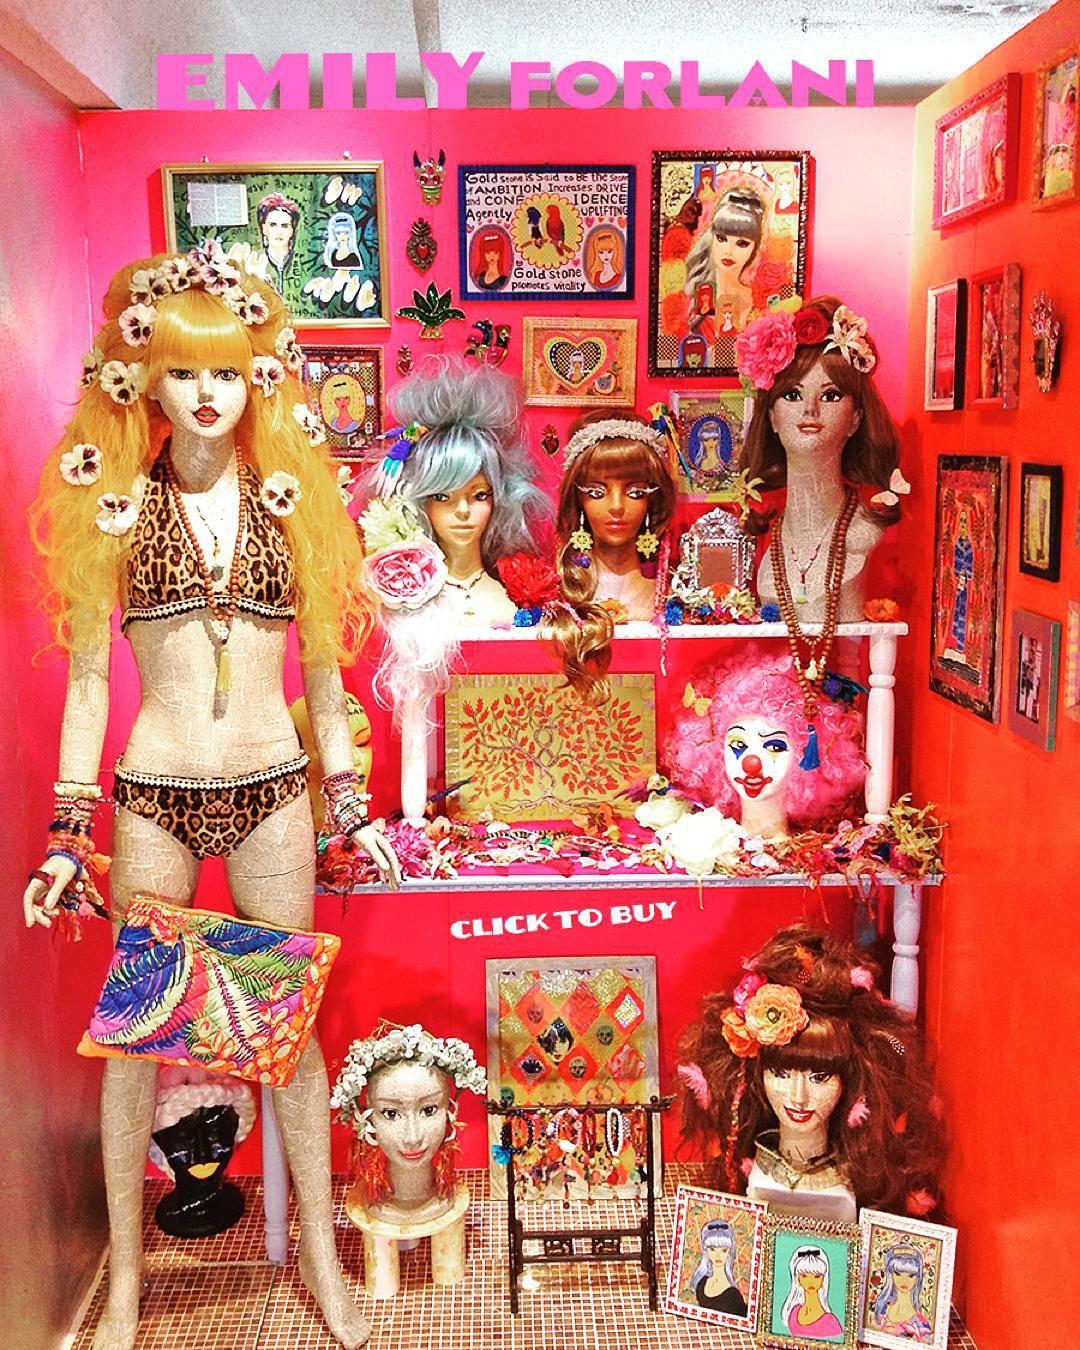 Wow! Monday starts with a bang  introducing Tokyo based artist Megumi Ueda. @emilyforlani #flamboyantrock #tokyo #jewellery #accessories #art #illustrations #oneofakind  by supermarket_sarah